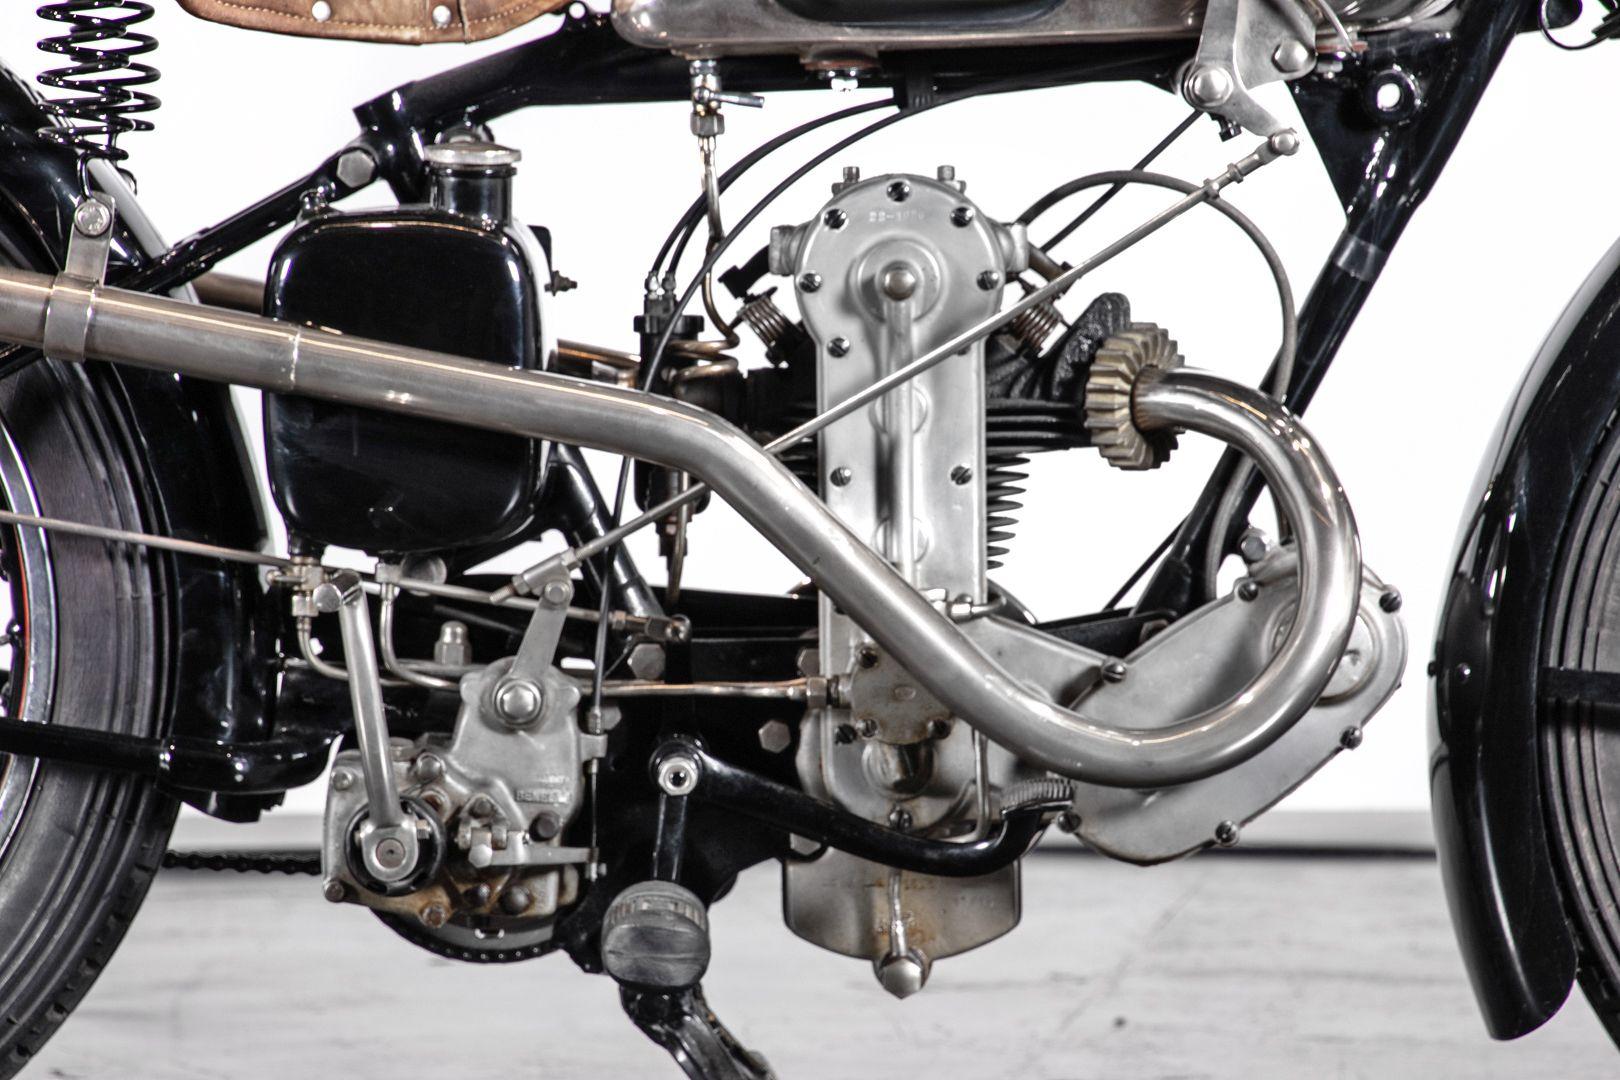 1934 Benelli 220 Sport 74370